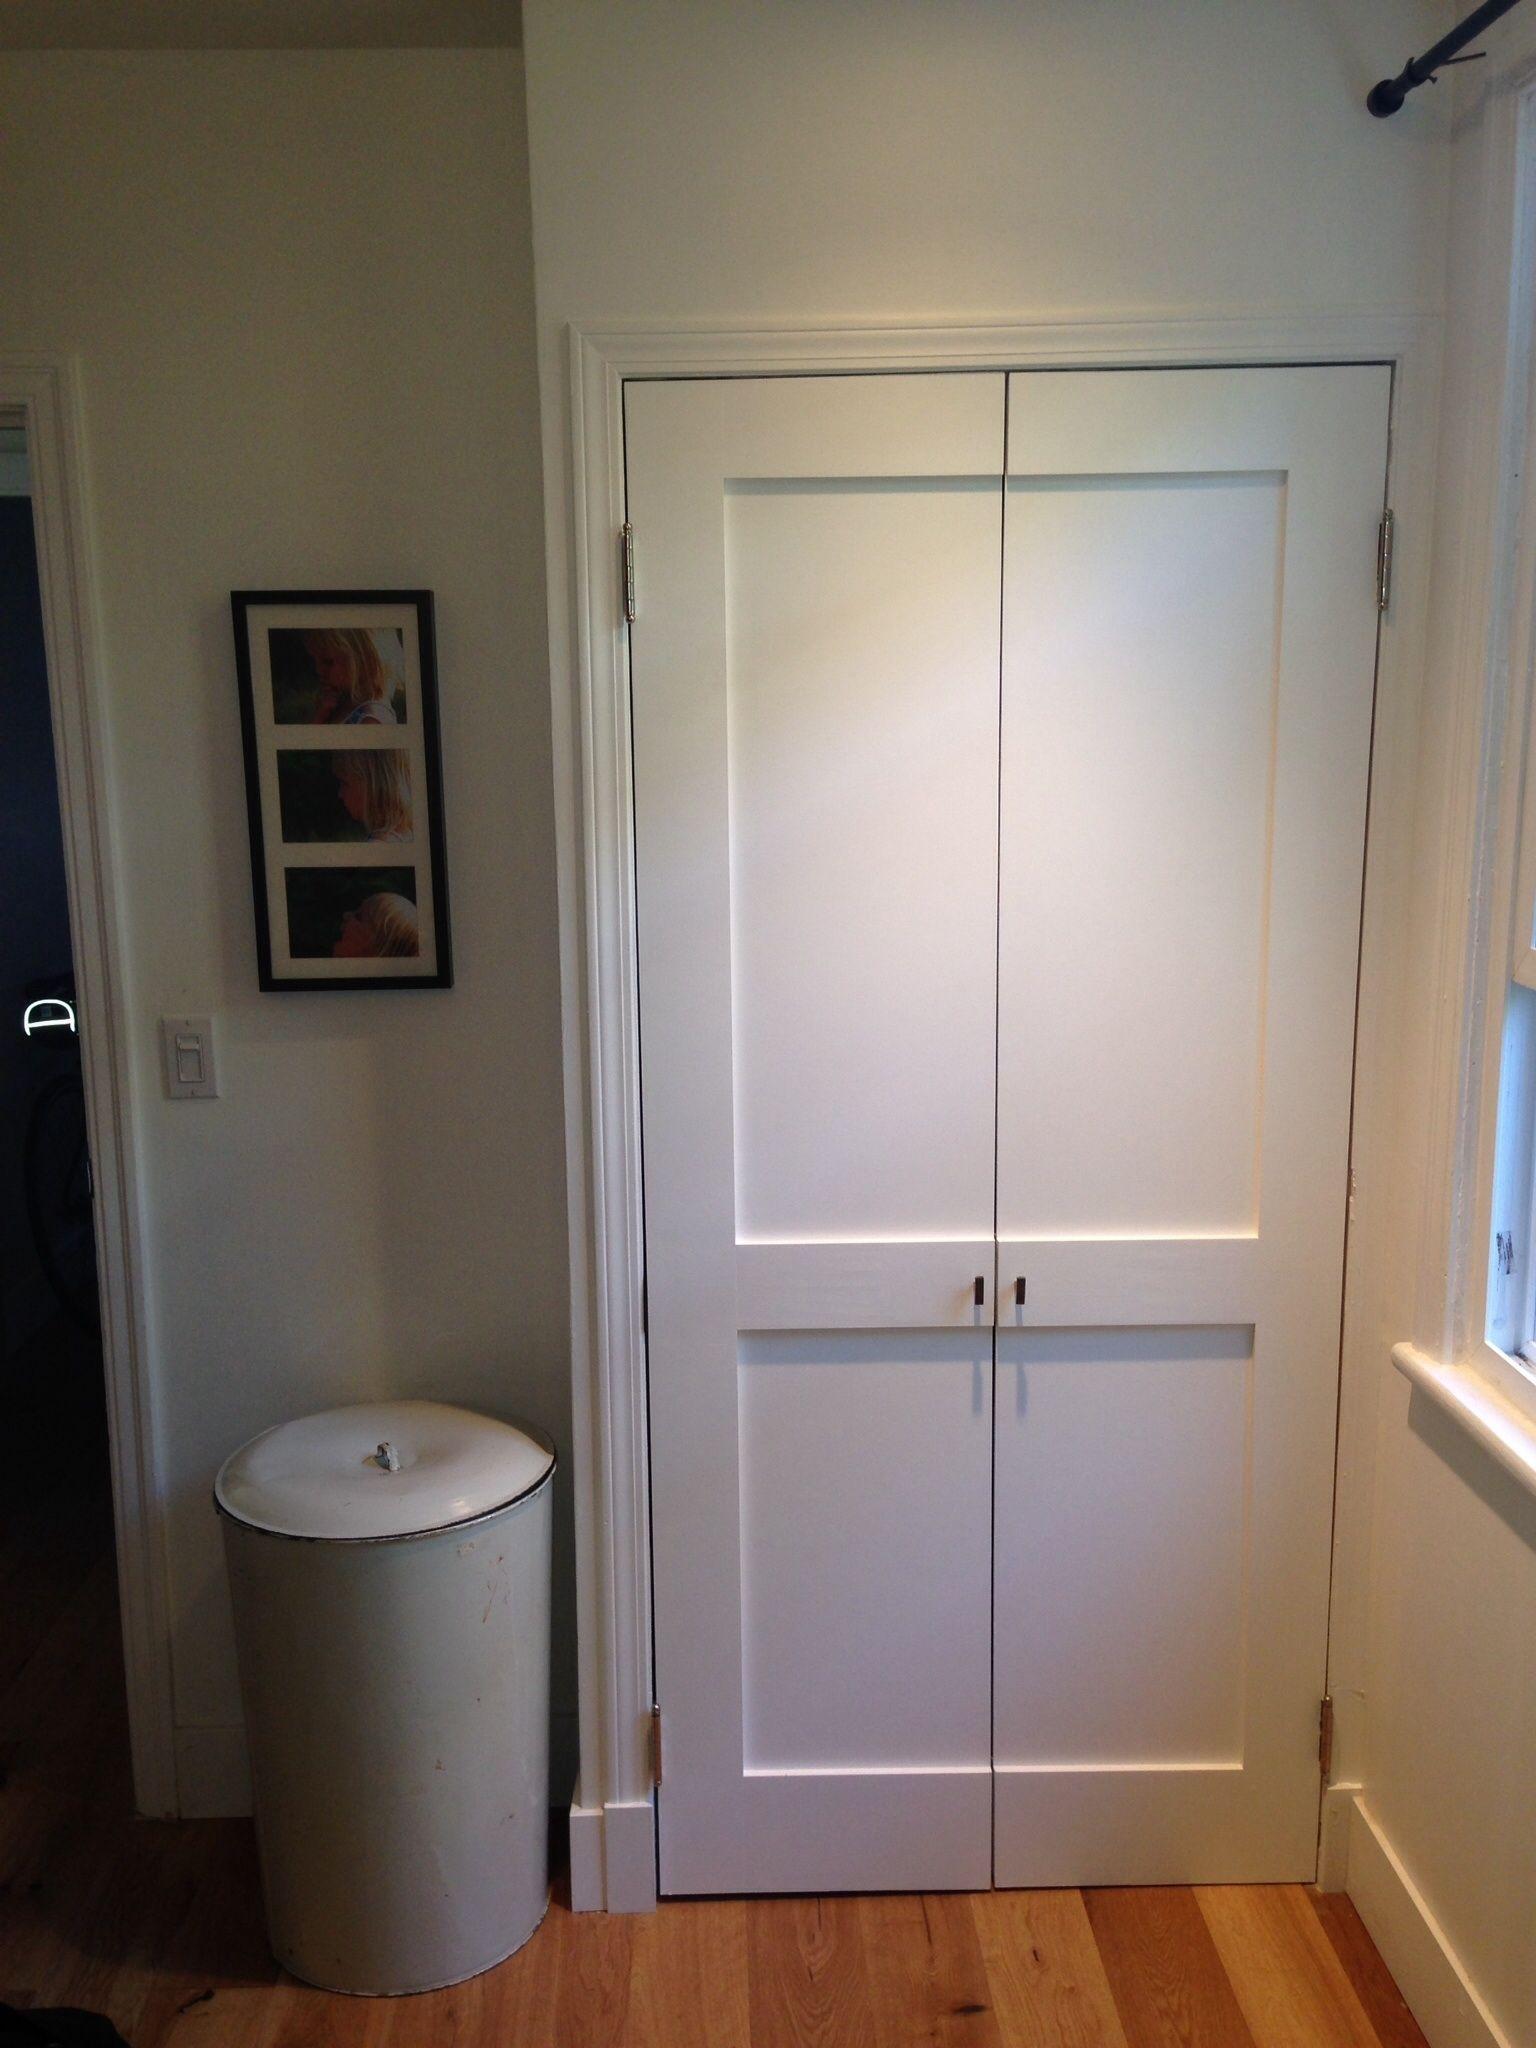 Bathroom Closet Door Alternatives & Bathroom Closet Door Alternatives | http://sourceabl.com | Pinterest ...